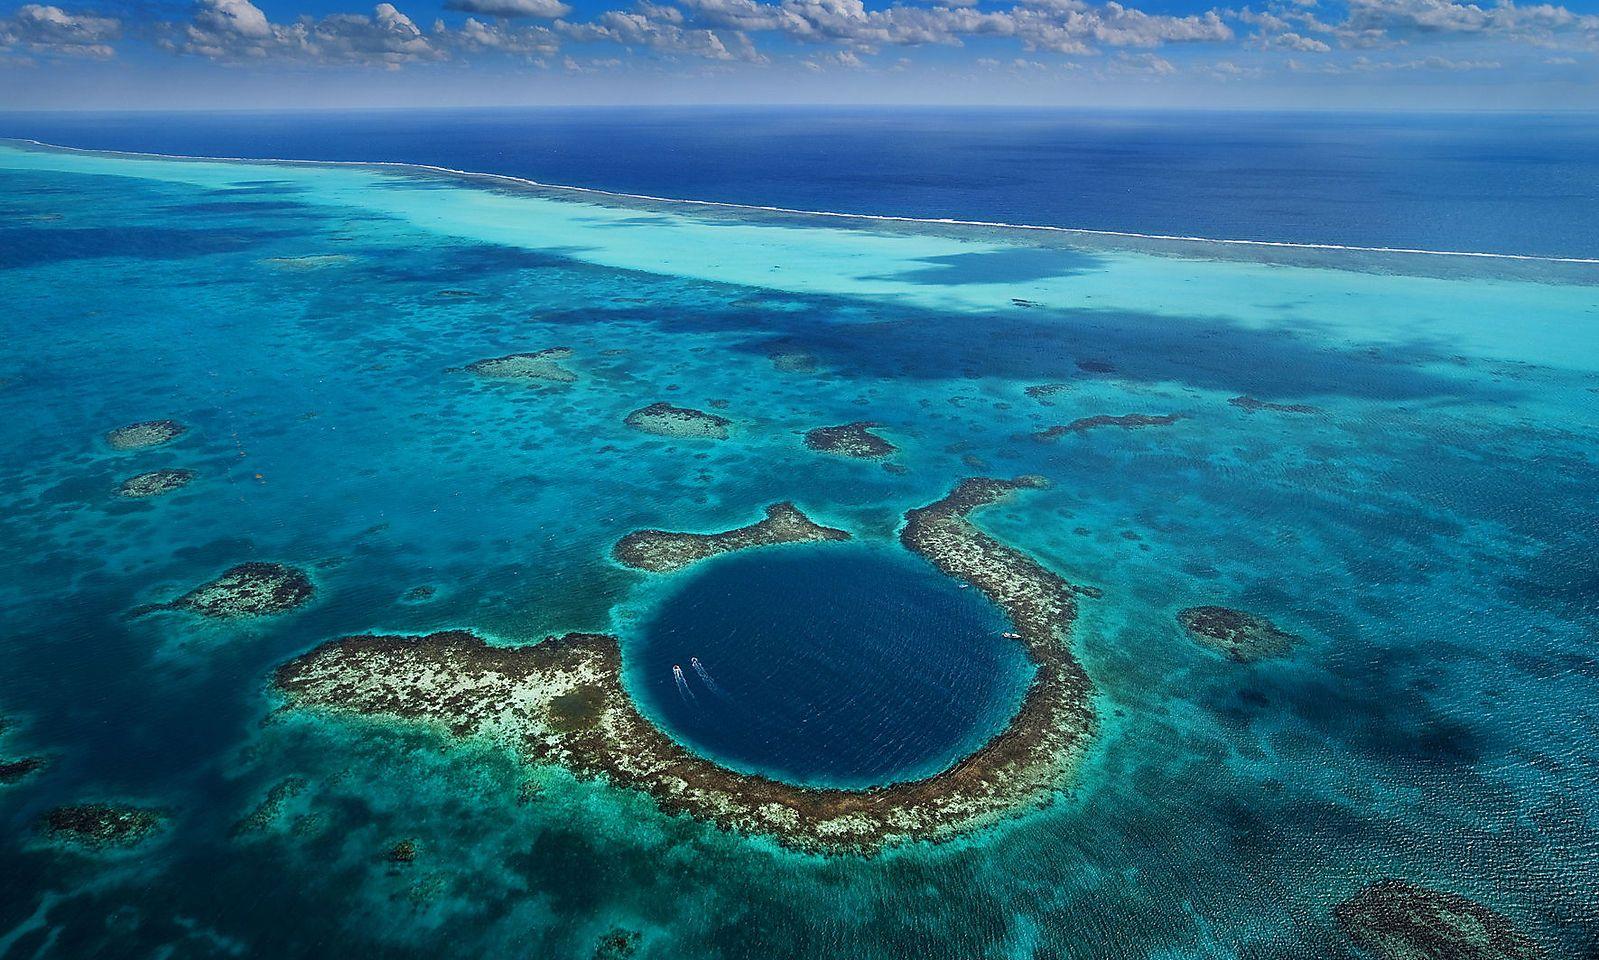 Das Blue Hole vor Belize